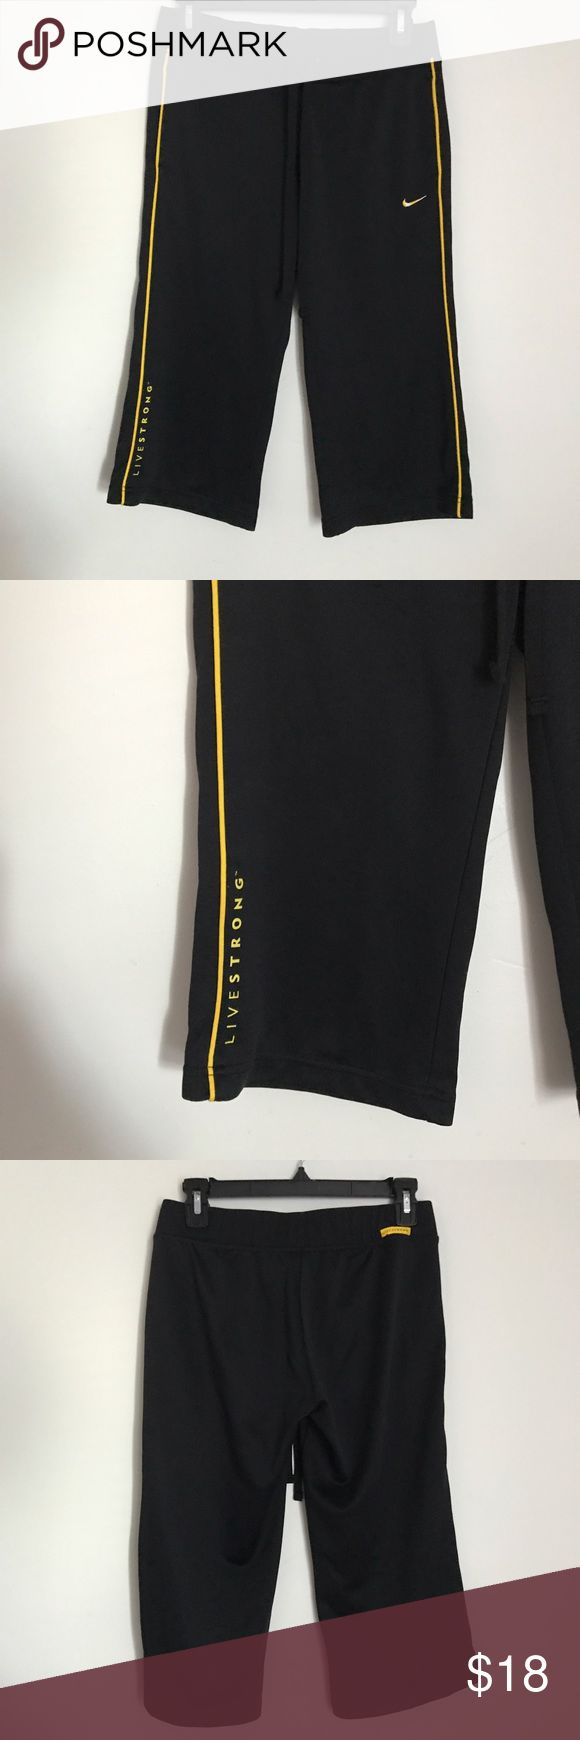 Nike Livestrong Capris Good condition size small black in yellow nike livestrong capris drawstring back upper  have livestrong logo. Nike Pants Capris